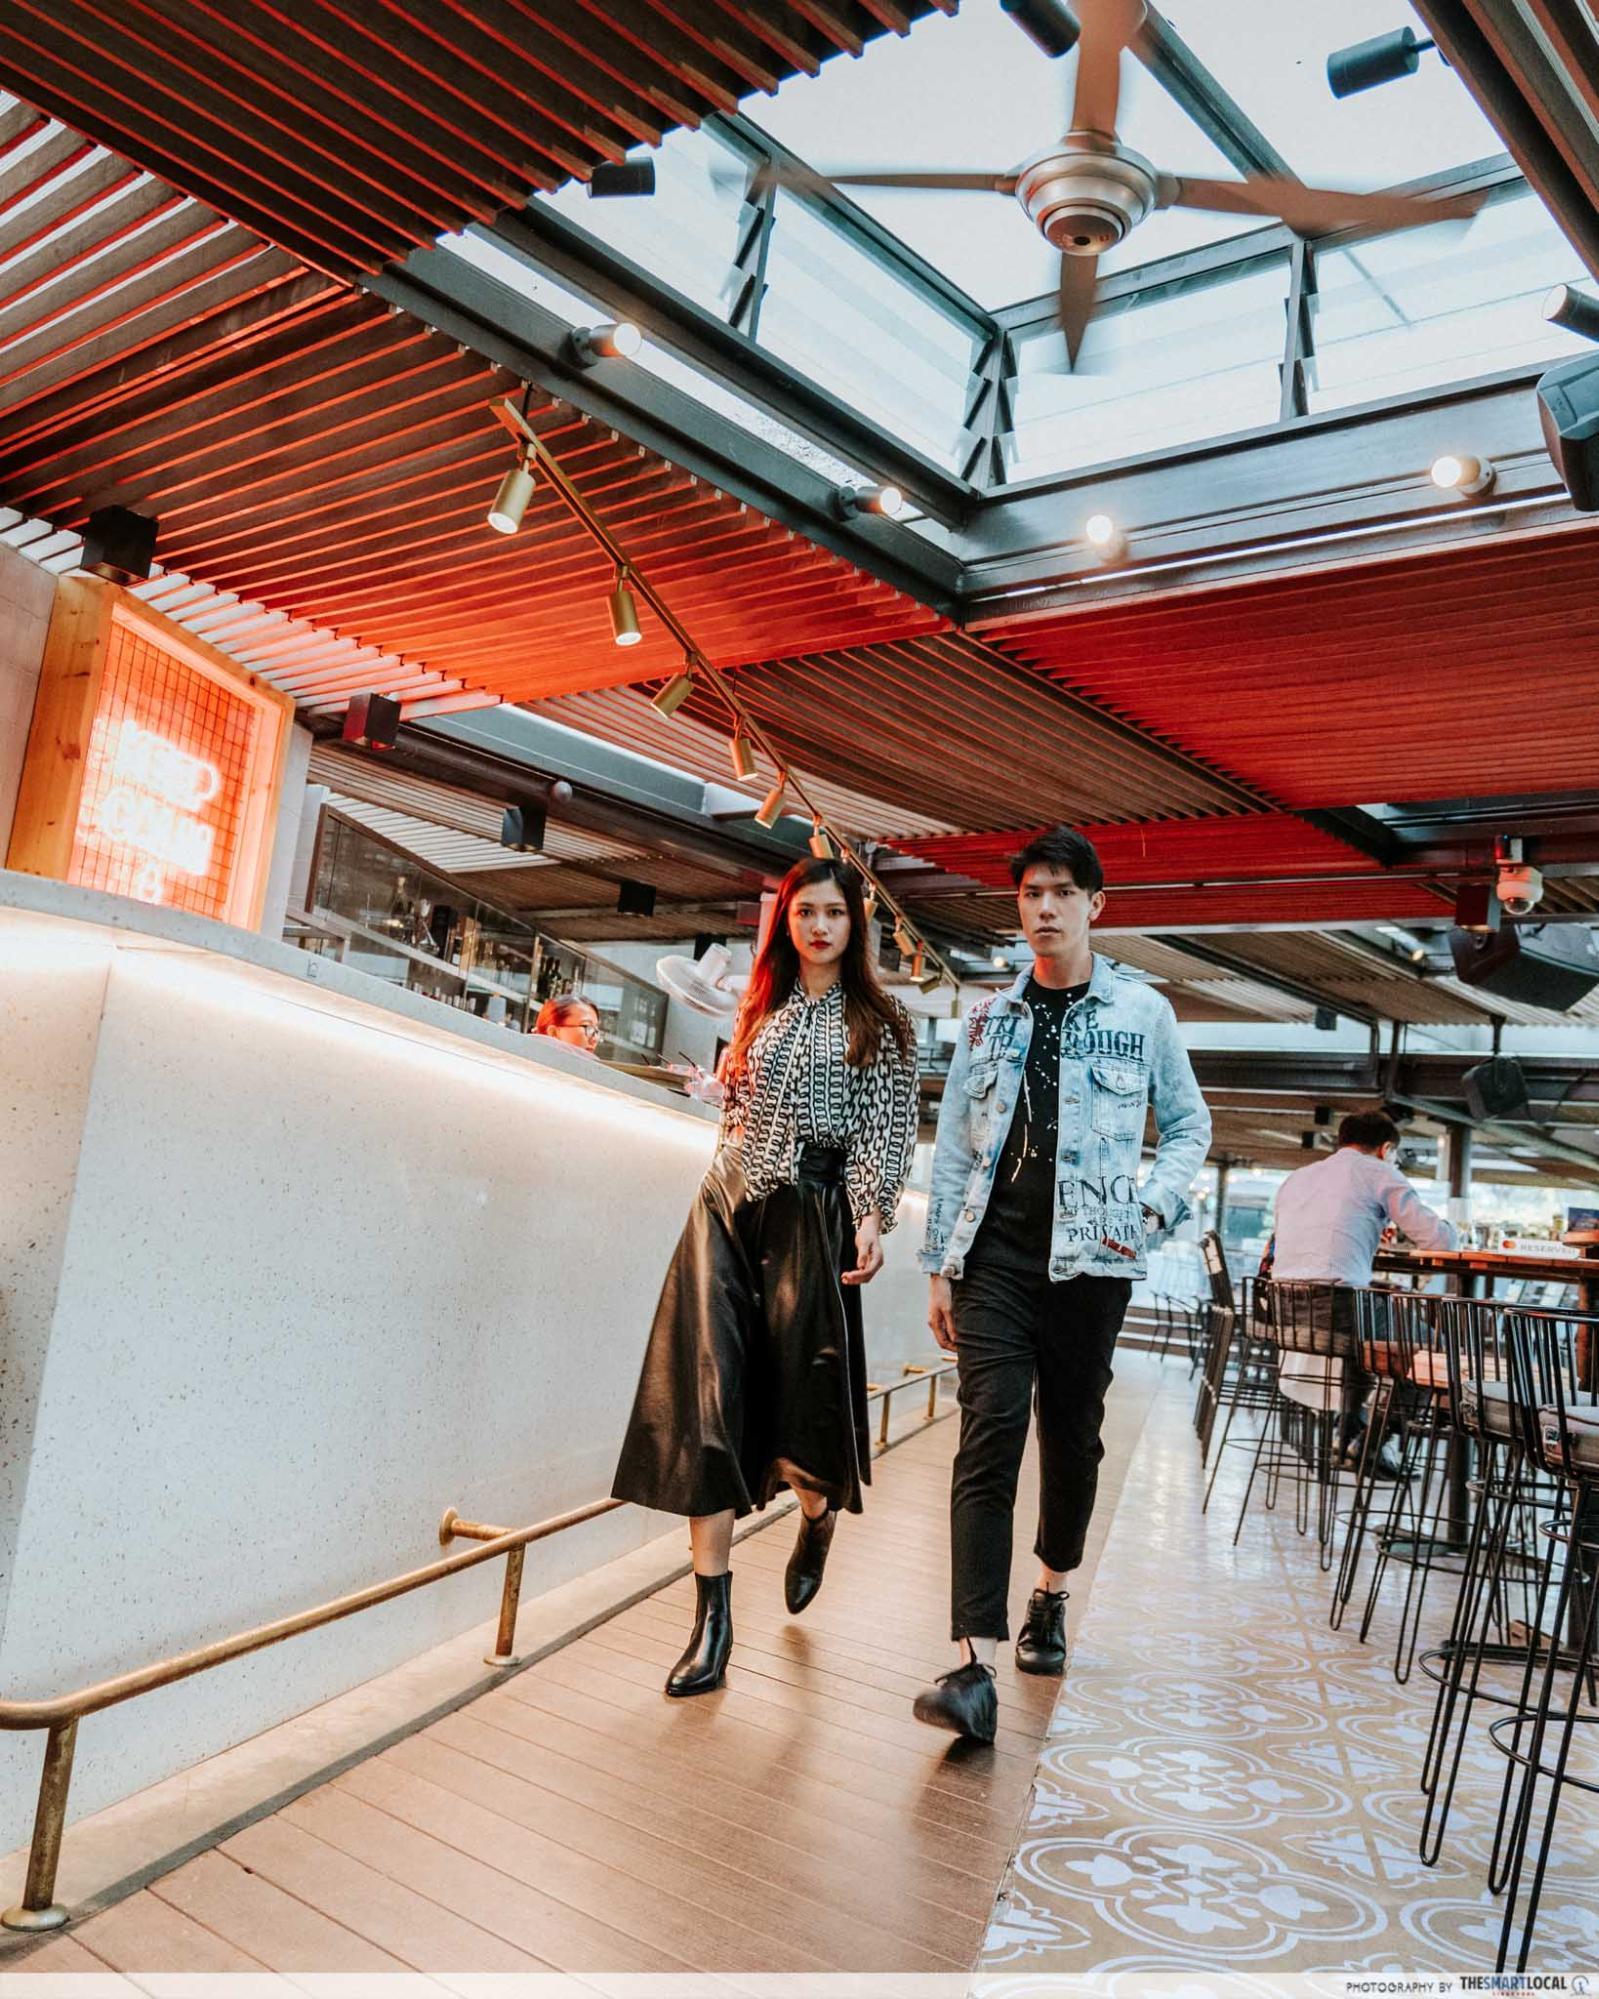 Dusk Restaurant & Bar